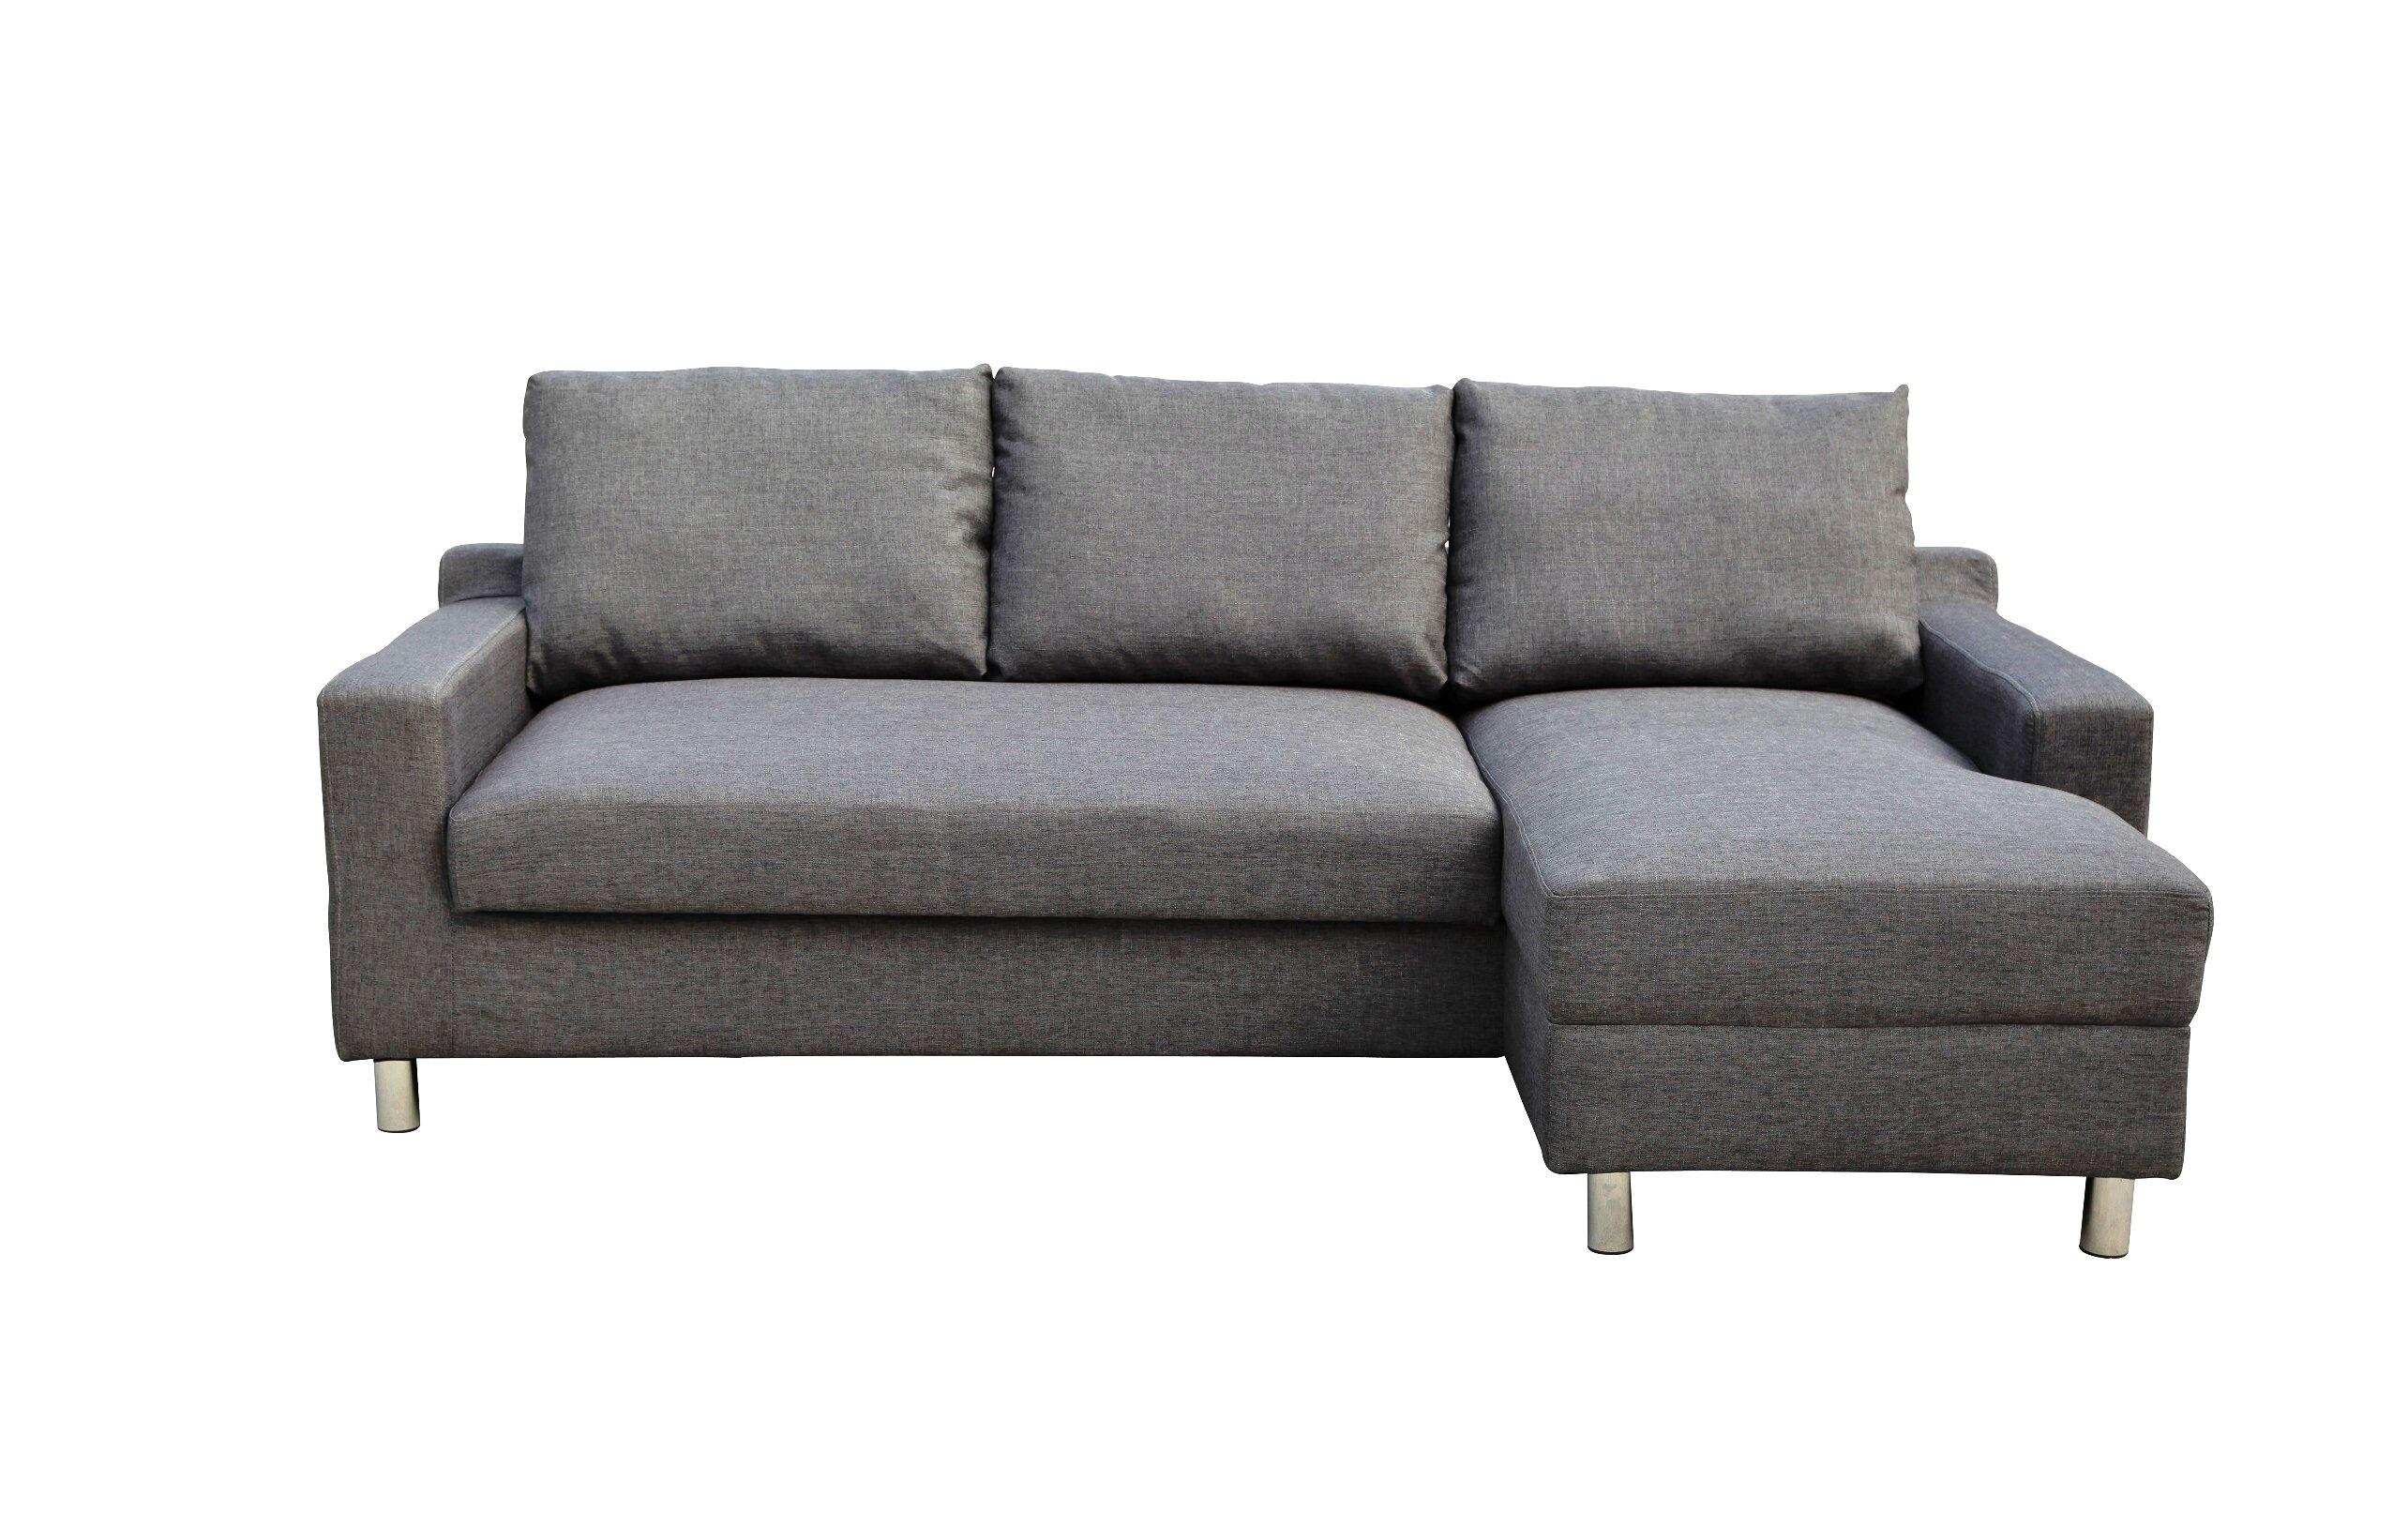 wade logan lainey sectional sofabed grey right facing wayfair rh wayfair com sofa bed grey ebay sofa bed grey ikea